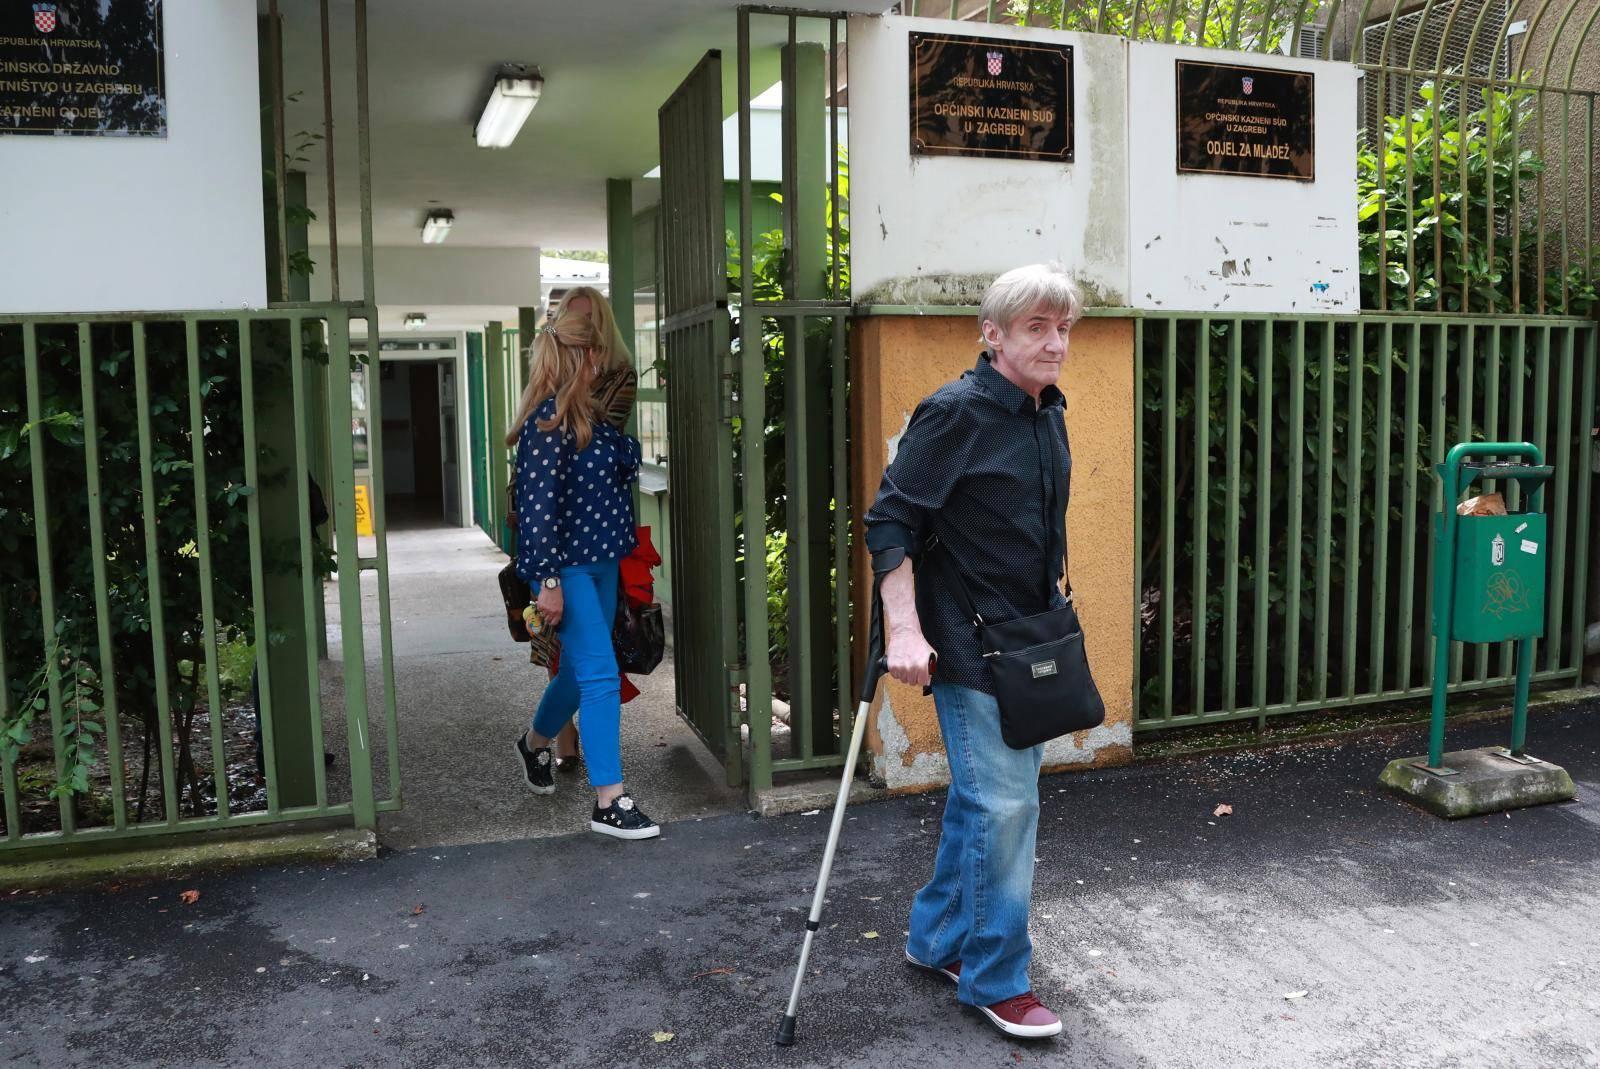 Zagreb: Dobro raspoloženi Rajko Dujmić s obitelji izlazi iz zgrade suda